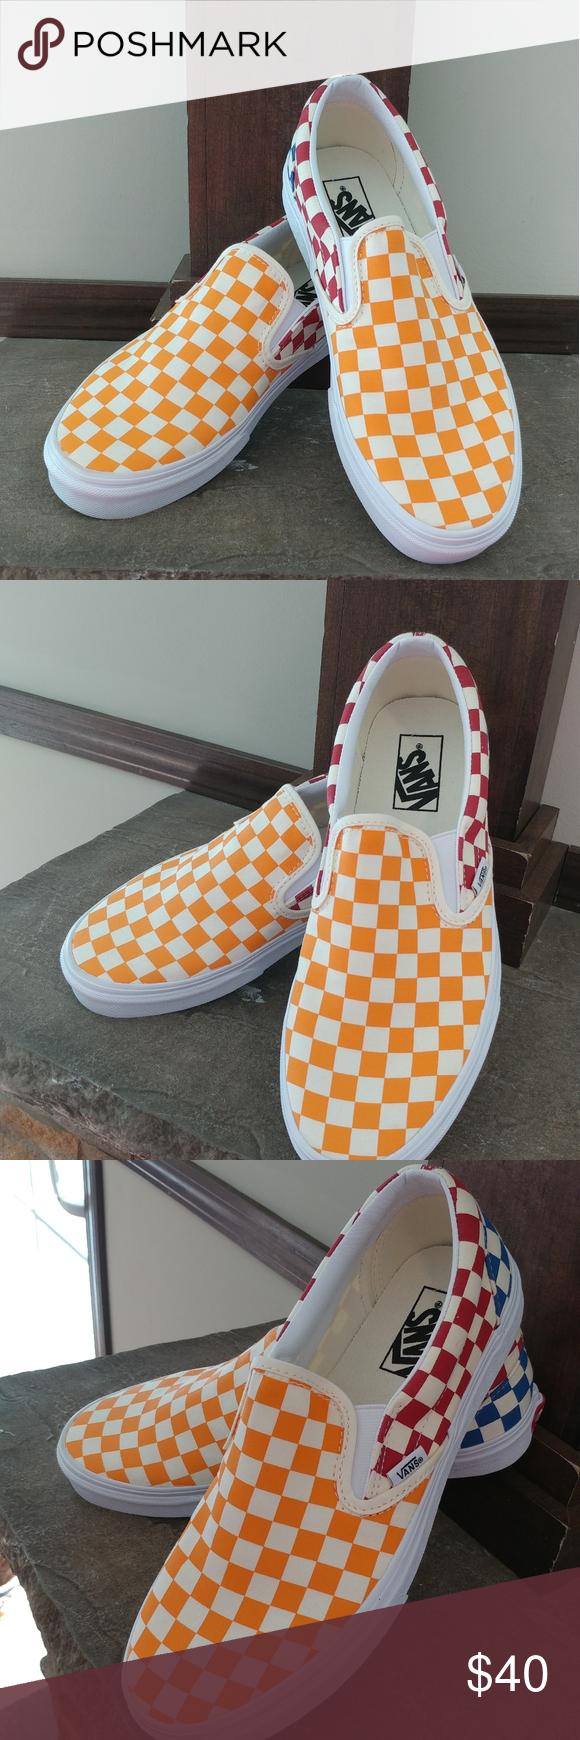 Vans Classic Slip On Checkerboard Multi In 2020 Vans Classic Slip On Slip On Vans Classic Slip On Sneaker